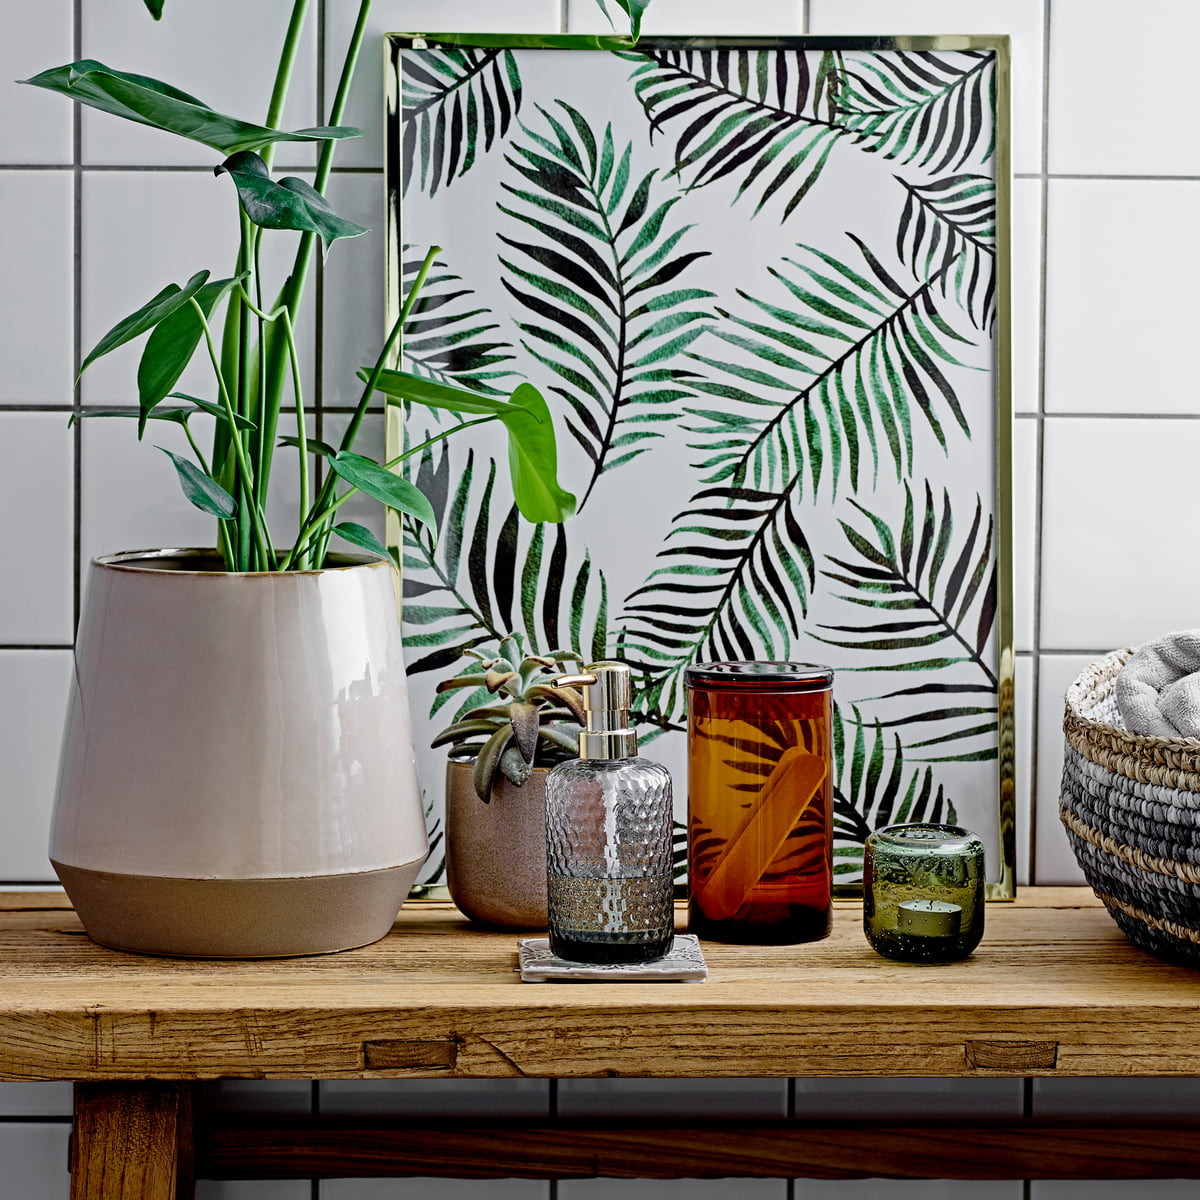 glas seifenspender von bloomingville connox. Black Bedroom Furniture Sets. Home Design Ideas